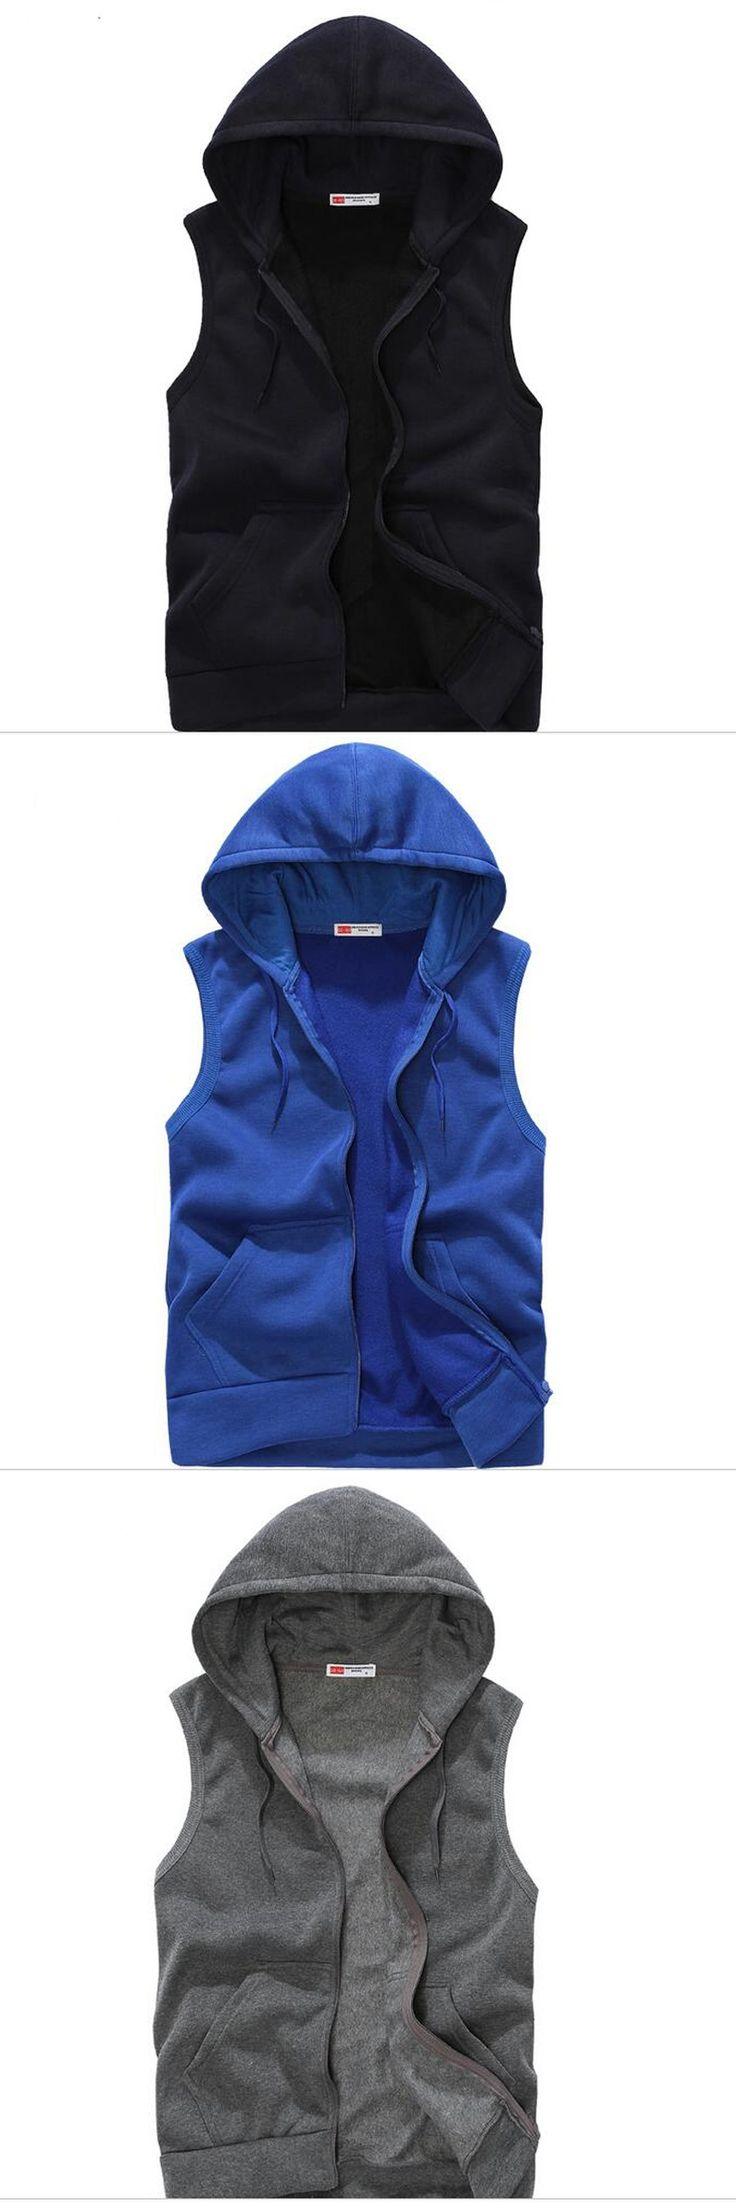 2017 Hooded Vest Jacket Men Sleeveless Jacket Casual Waistcoat Zipper Cardigan Streetwear Hoody Fashion Solid Hip Hop Coats Z15